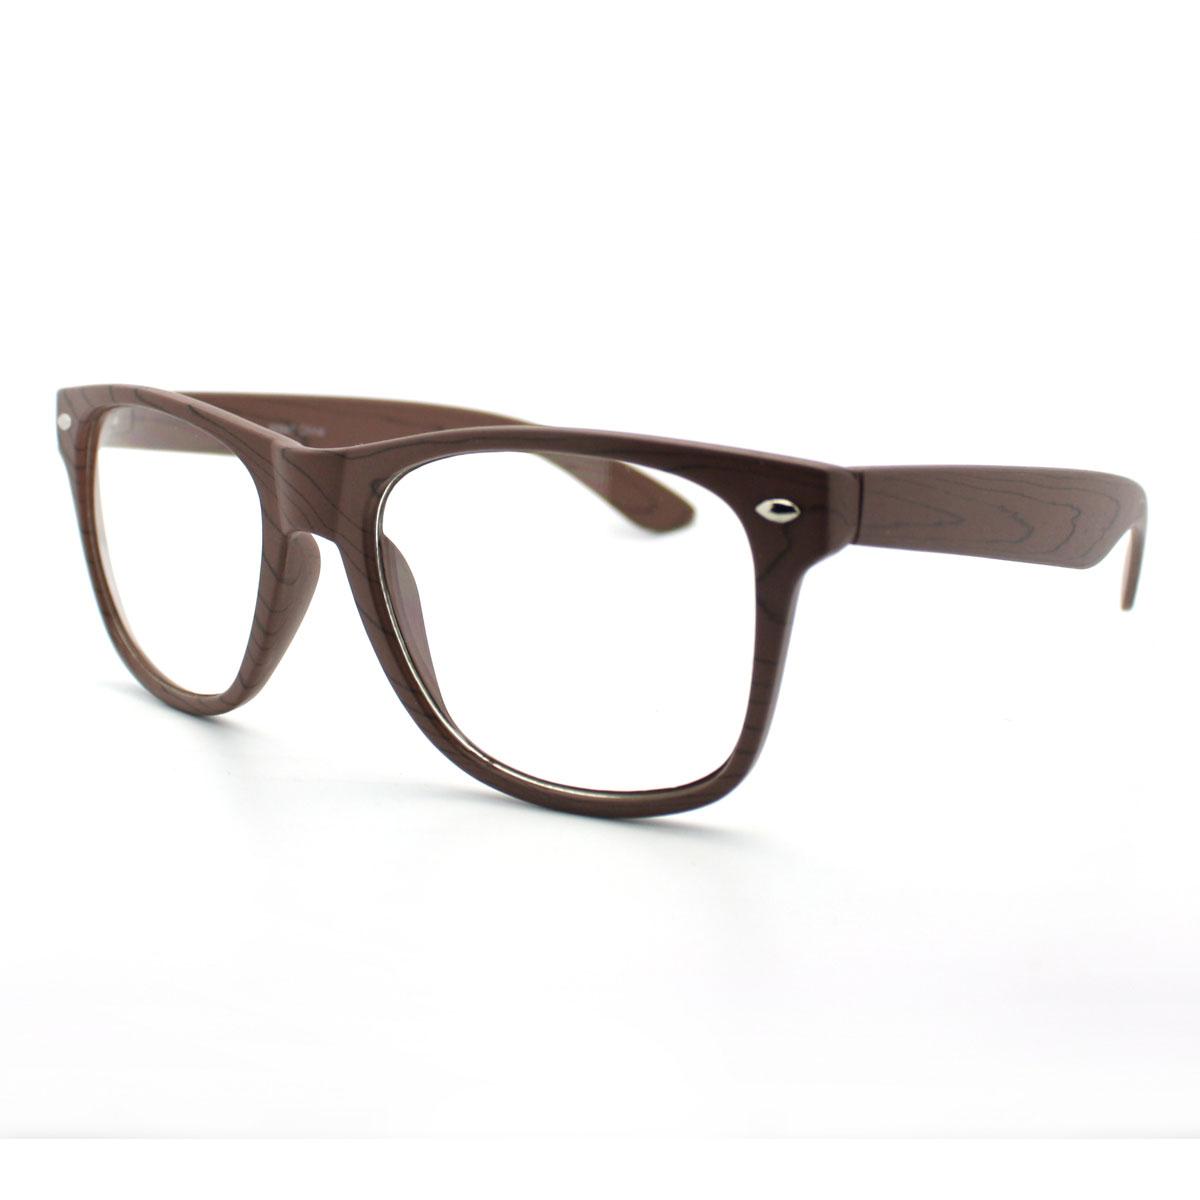 Wood Grain Glasses Frame : Wood Grain Print Nerd Geek Eye Glasses with Clear Lens eBay